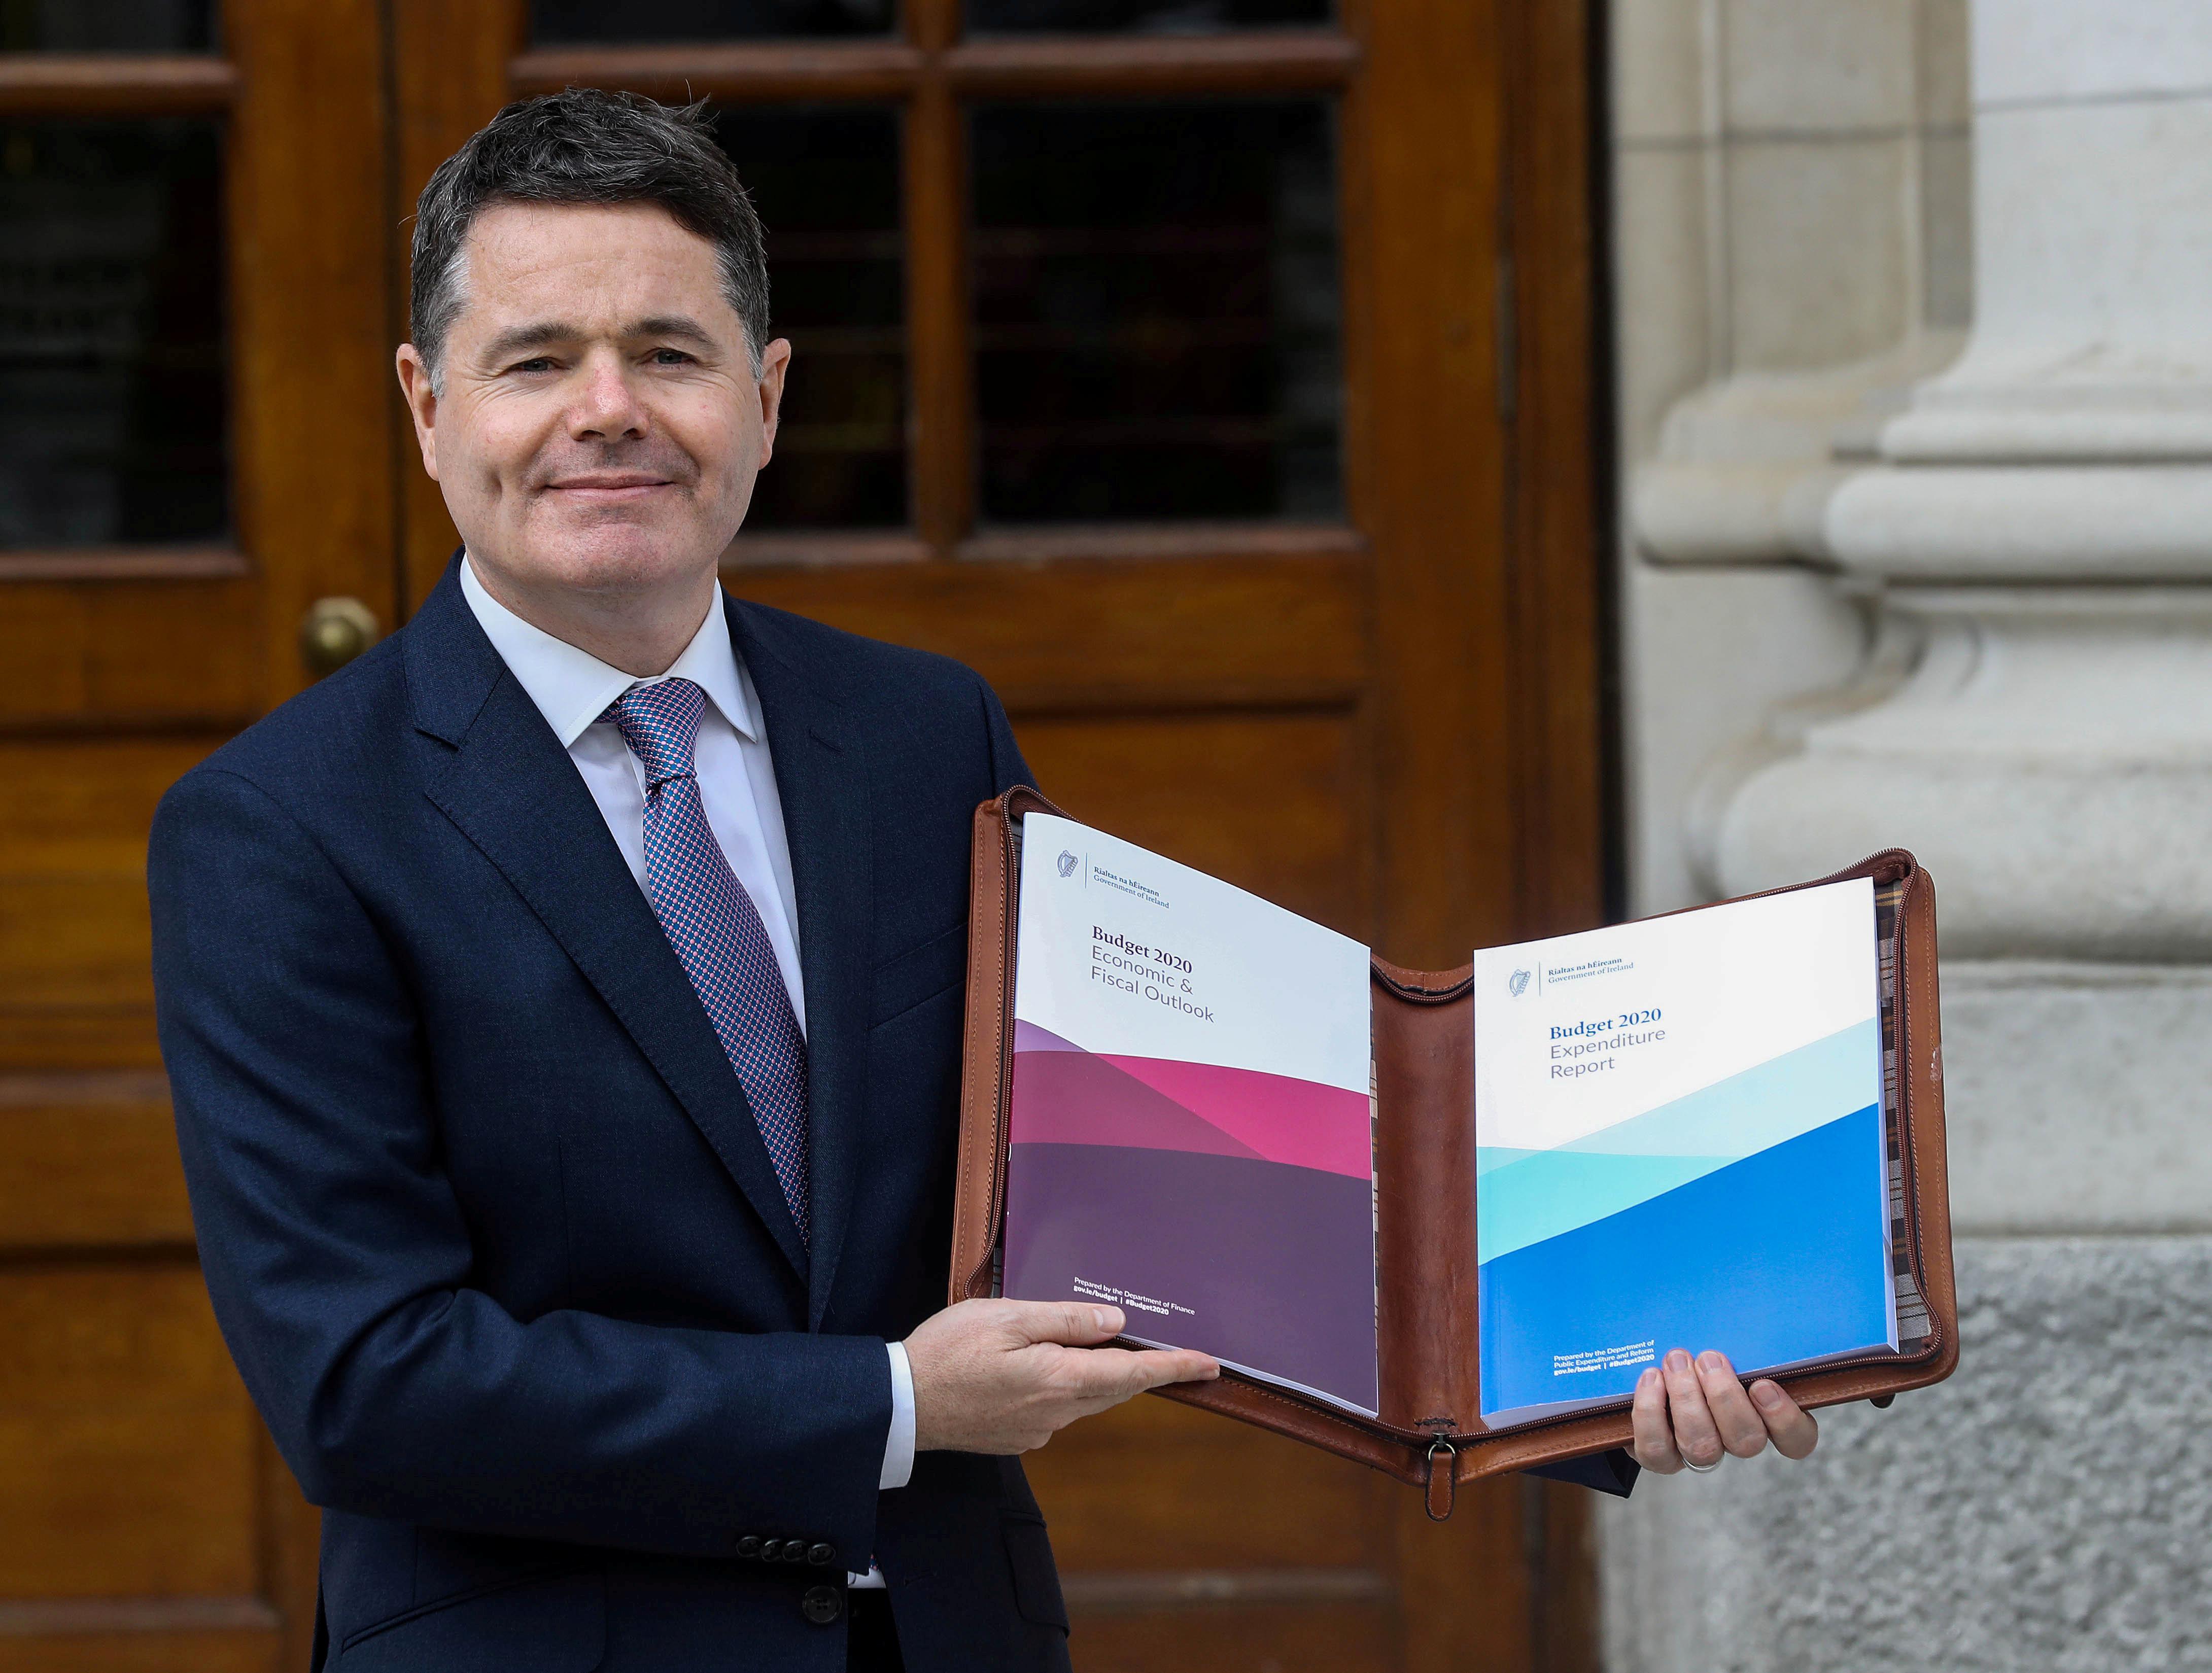 Corporate tax boom to hand Ireland bigger budget surplus